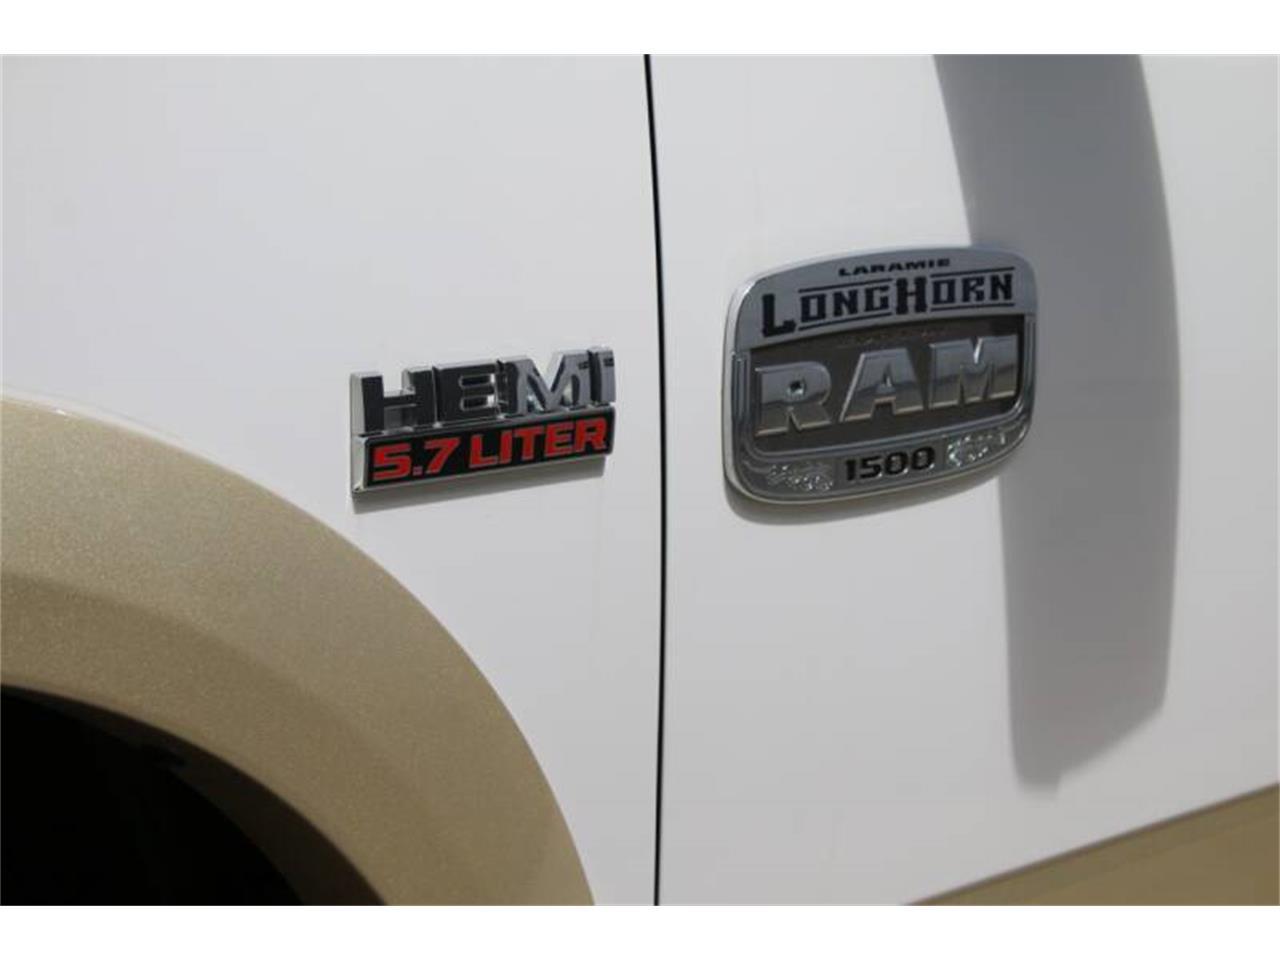 2014 Dodge Ram 1500 (CC-1345554) for sale in Hilton, New York